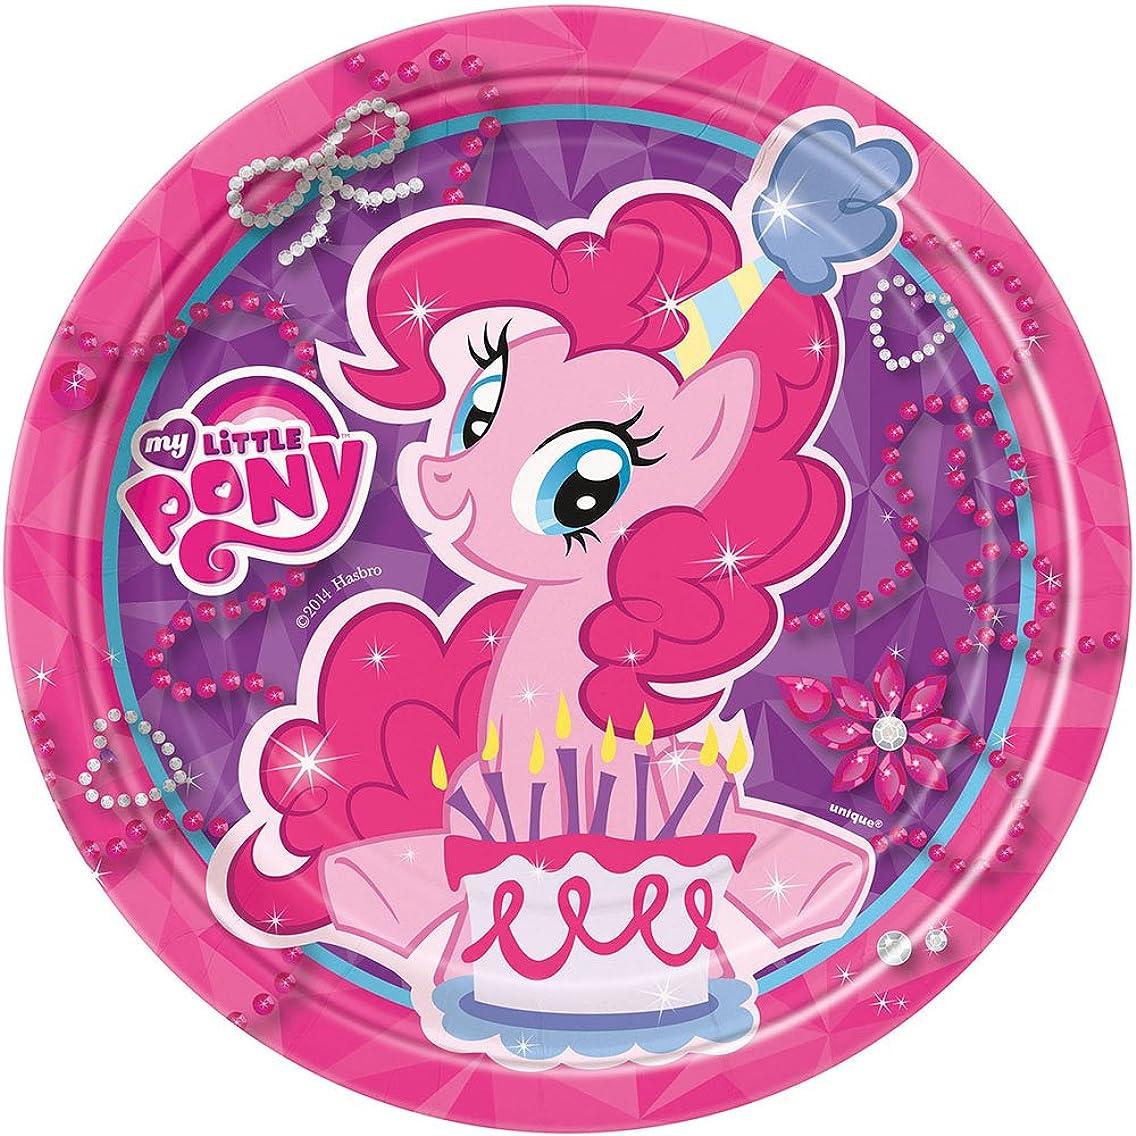 My Little Pony Dessert Plates, 8ct